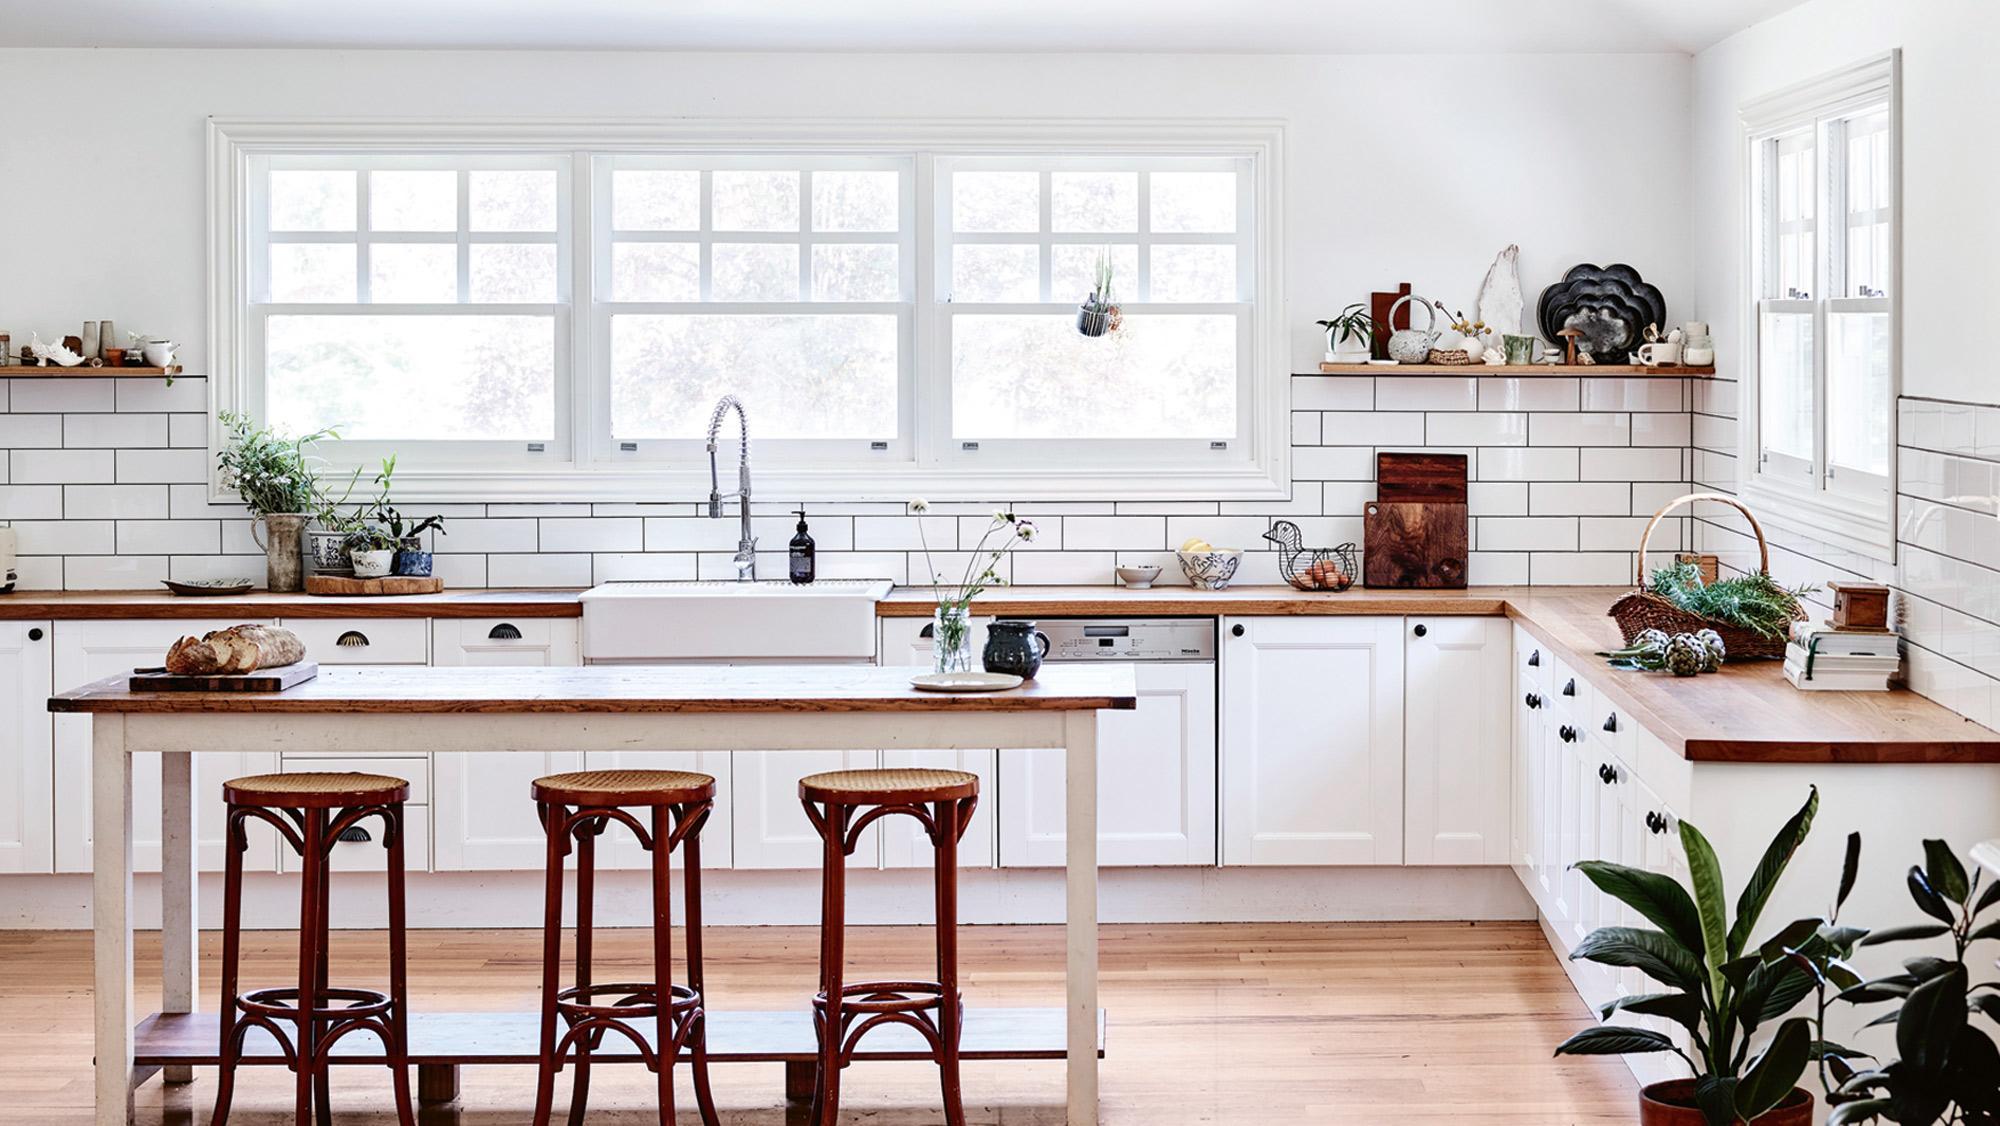 Country kitchen white-country kitchen-island-roper-blaylock-acsmar2018 XDONCHF